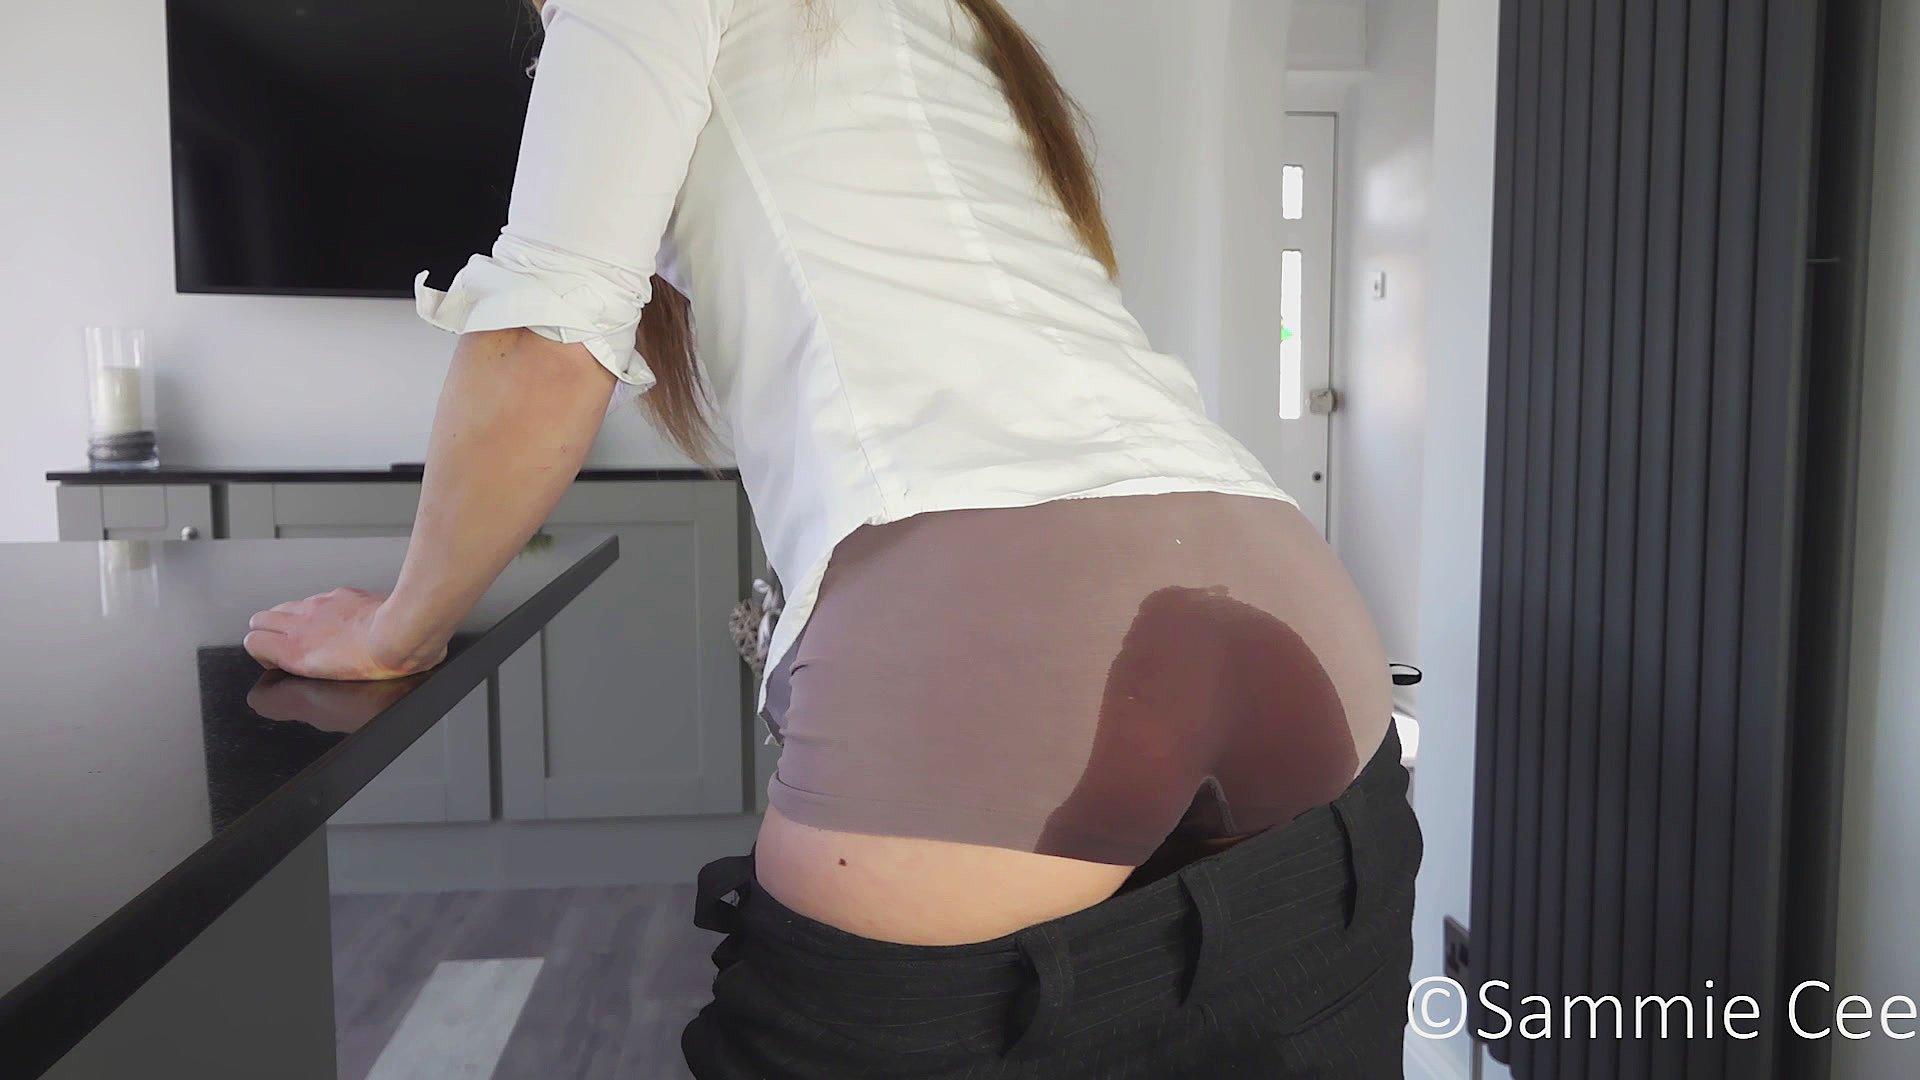 Just pissing panties